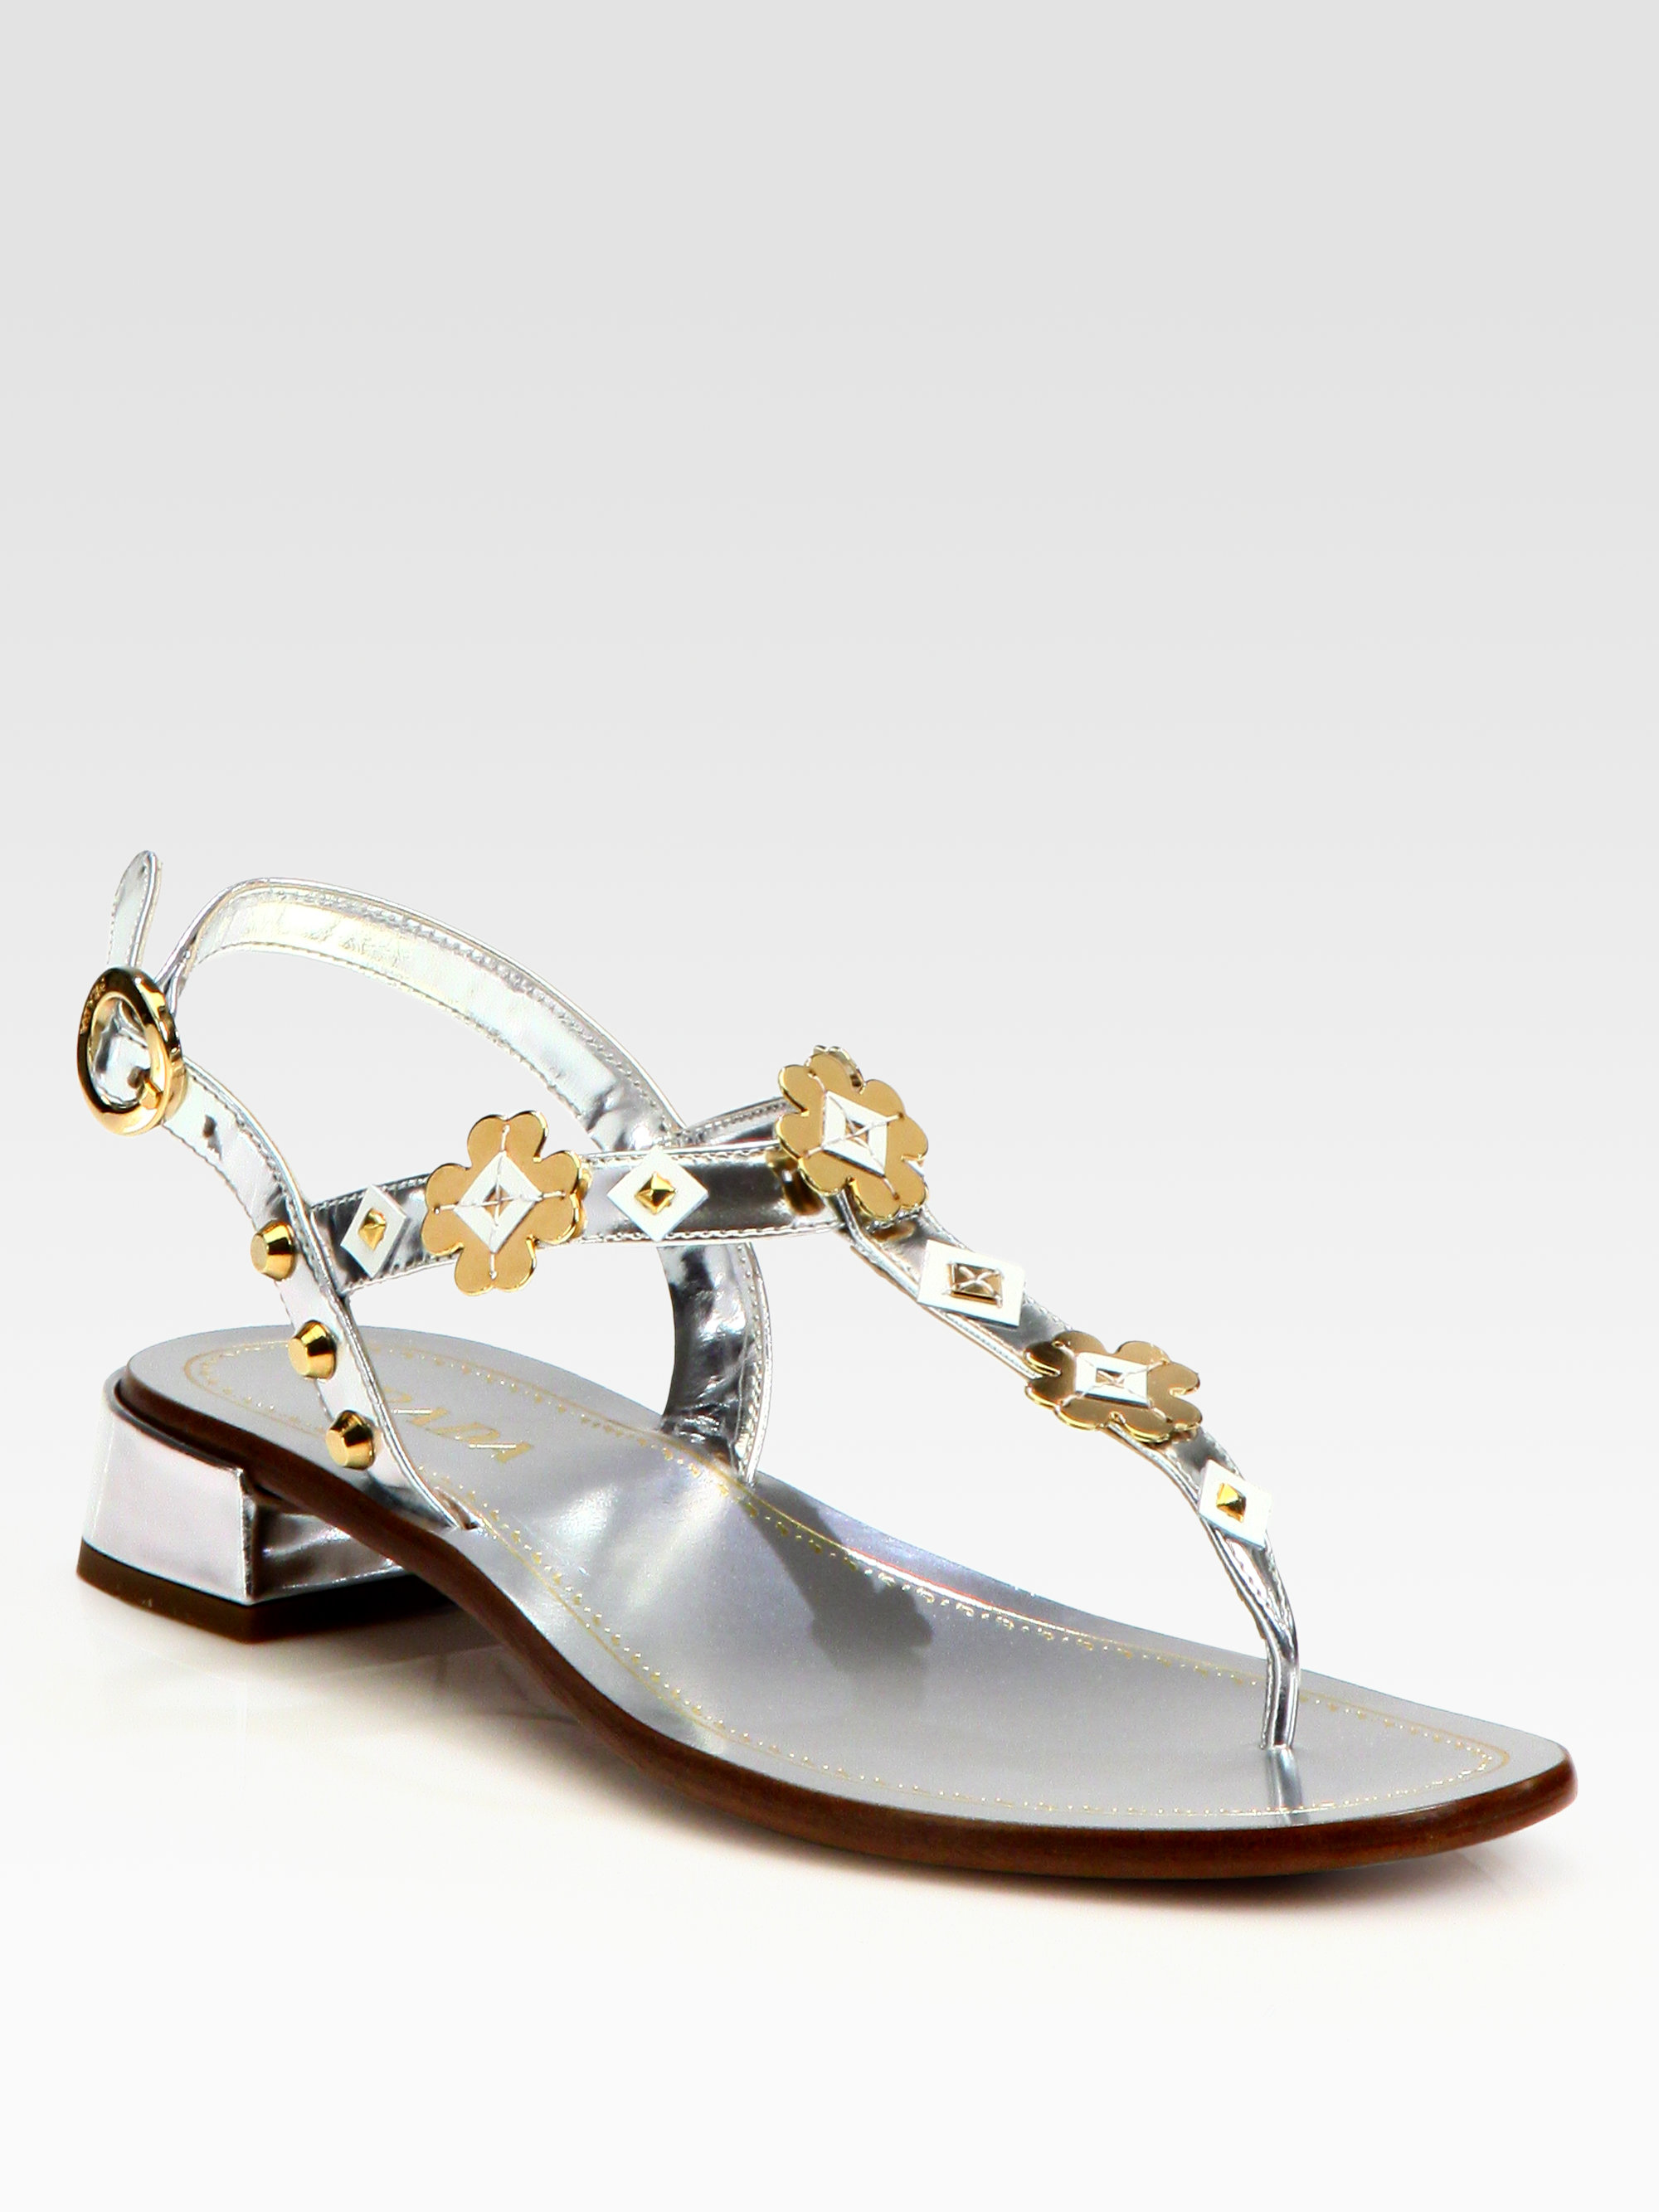 7050728e4c6 Lyst - Prada Metallic Leather Flower Appliqu233 Thong Sandals in ...